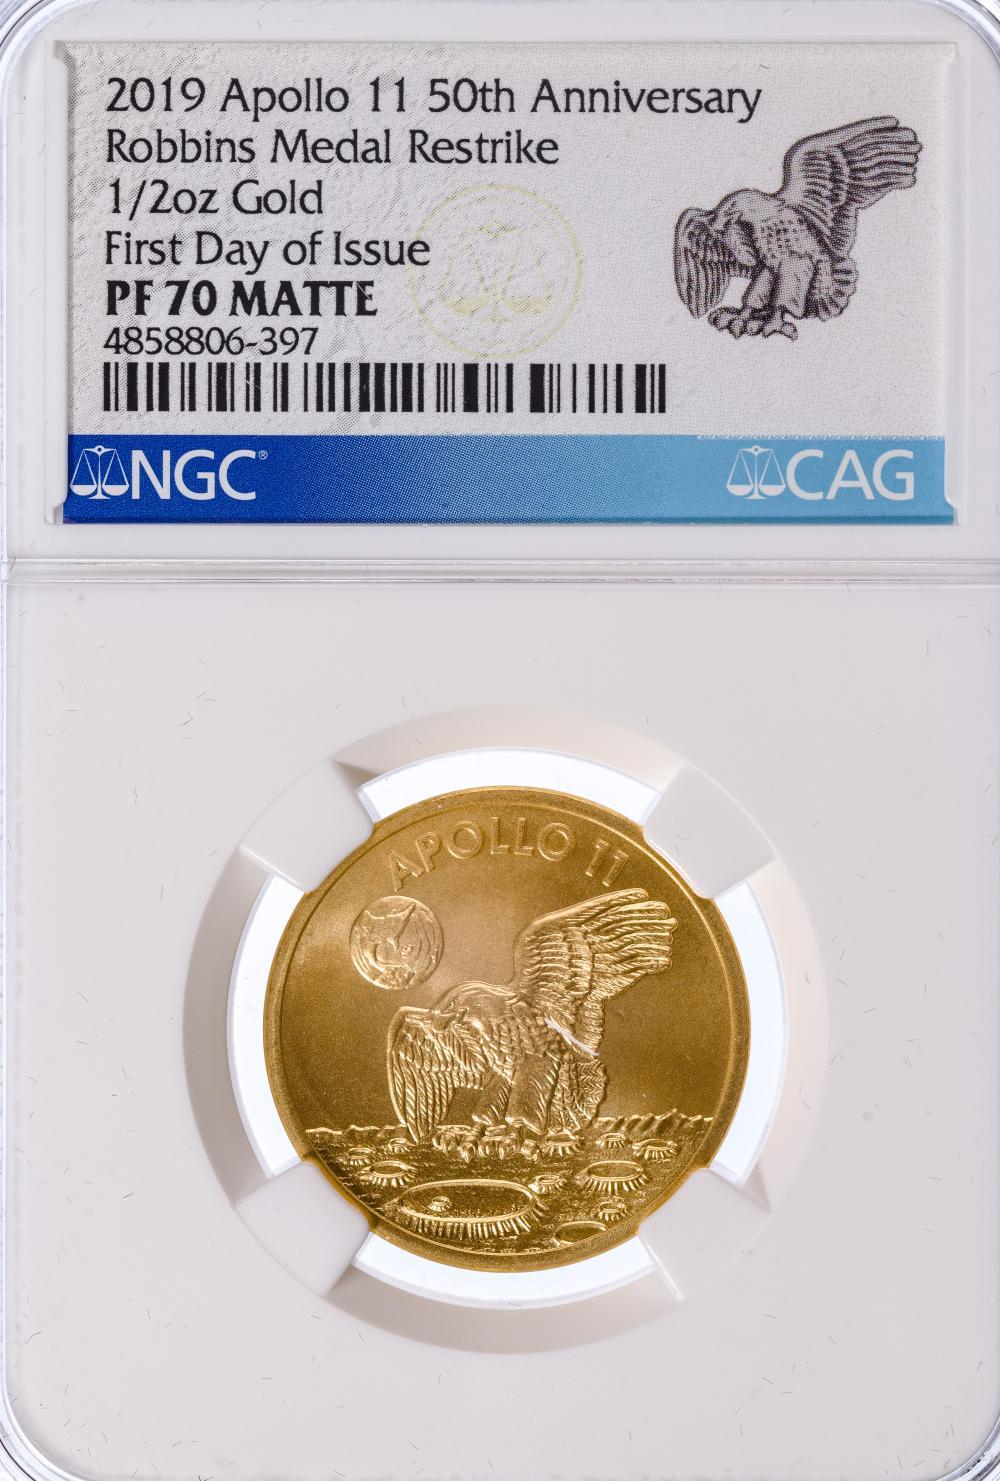 2019 Apollo 11 50th Anniversary 1/2oz Gold Robbins Medal Restrike PF-70 Matte NGC